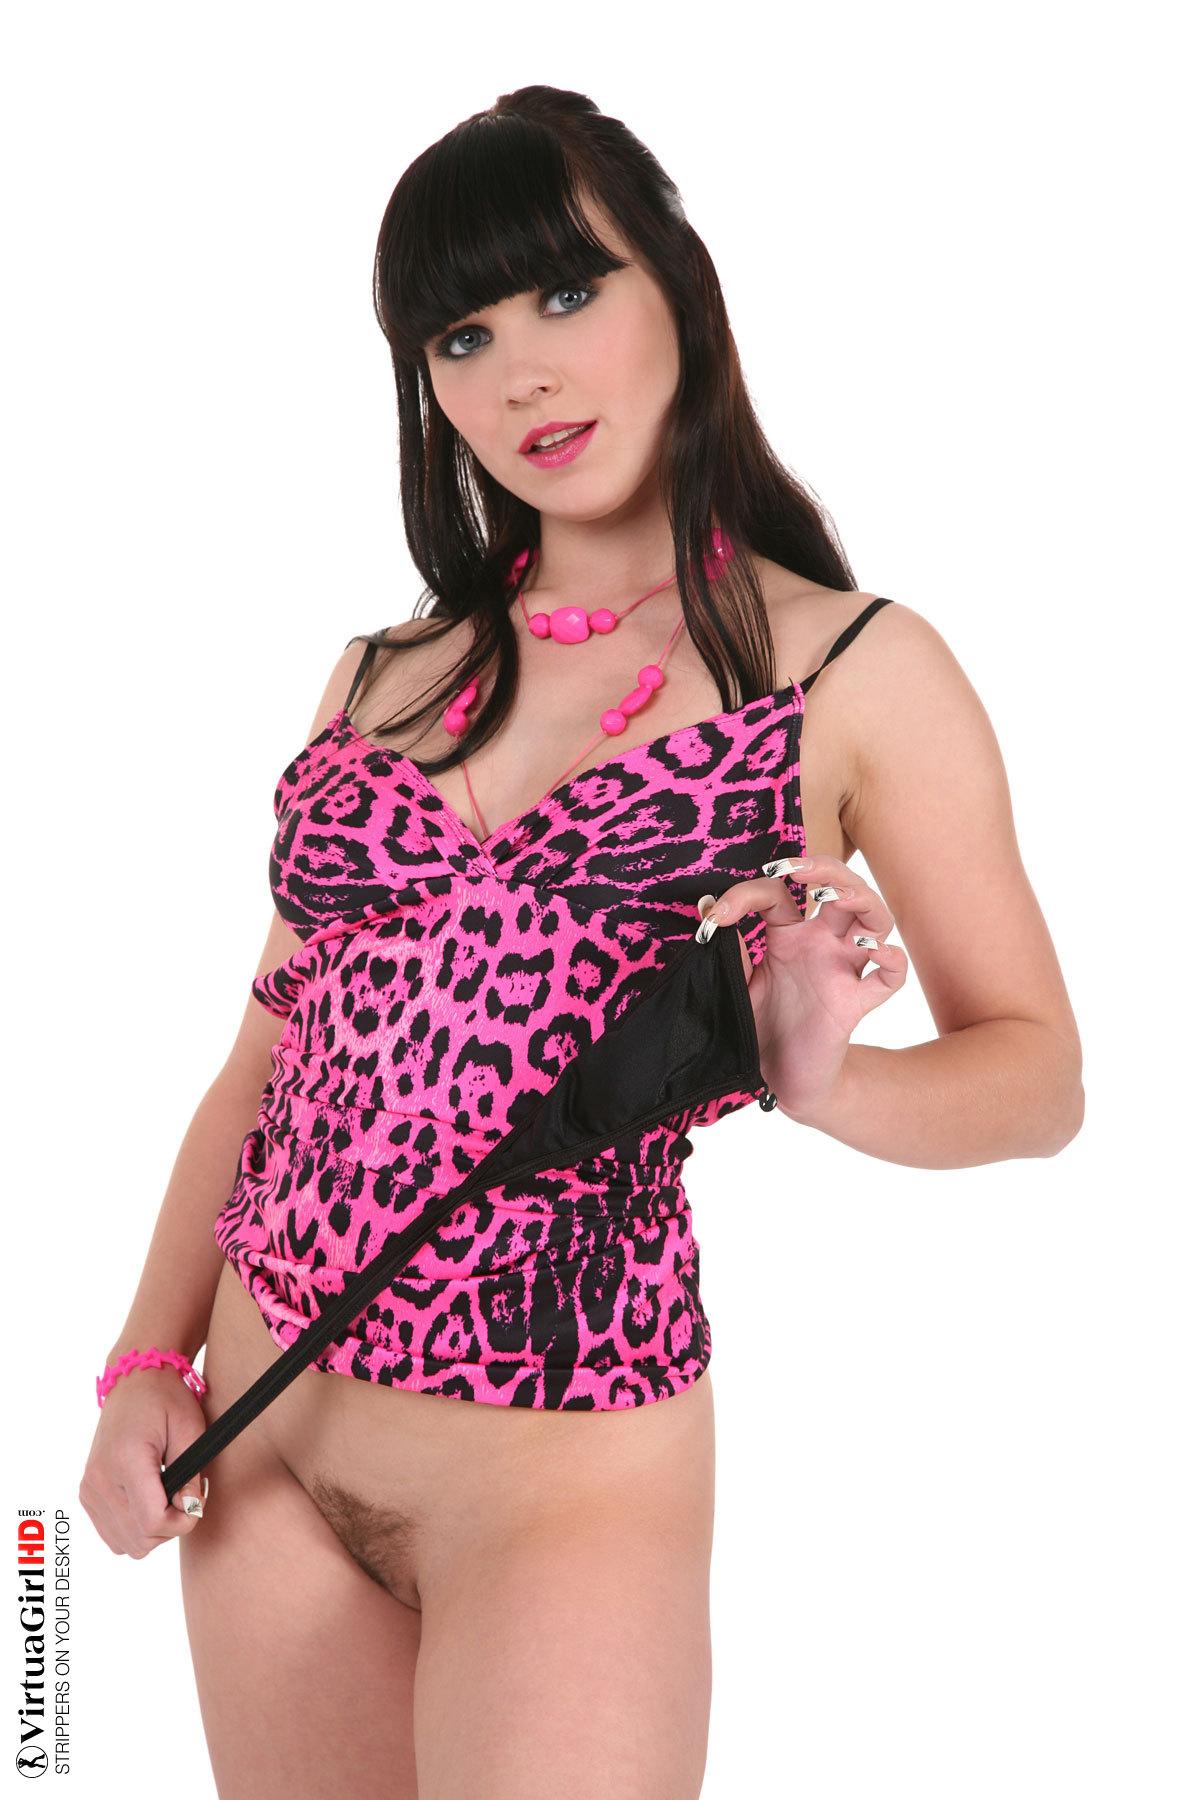 girls on webcam stripping